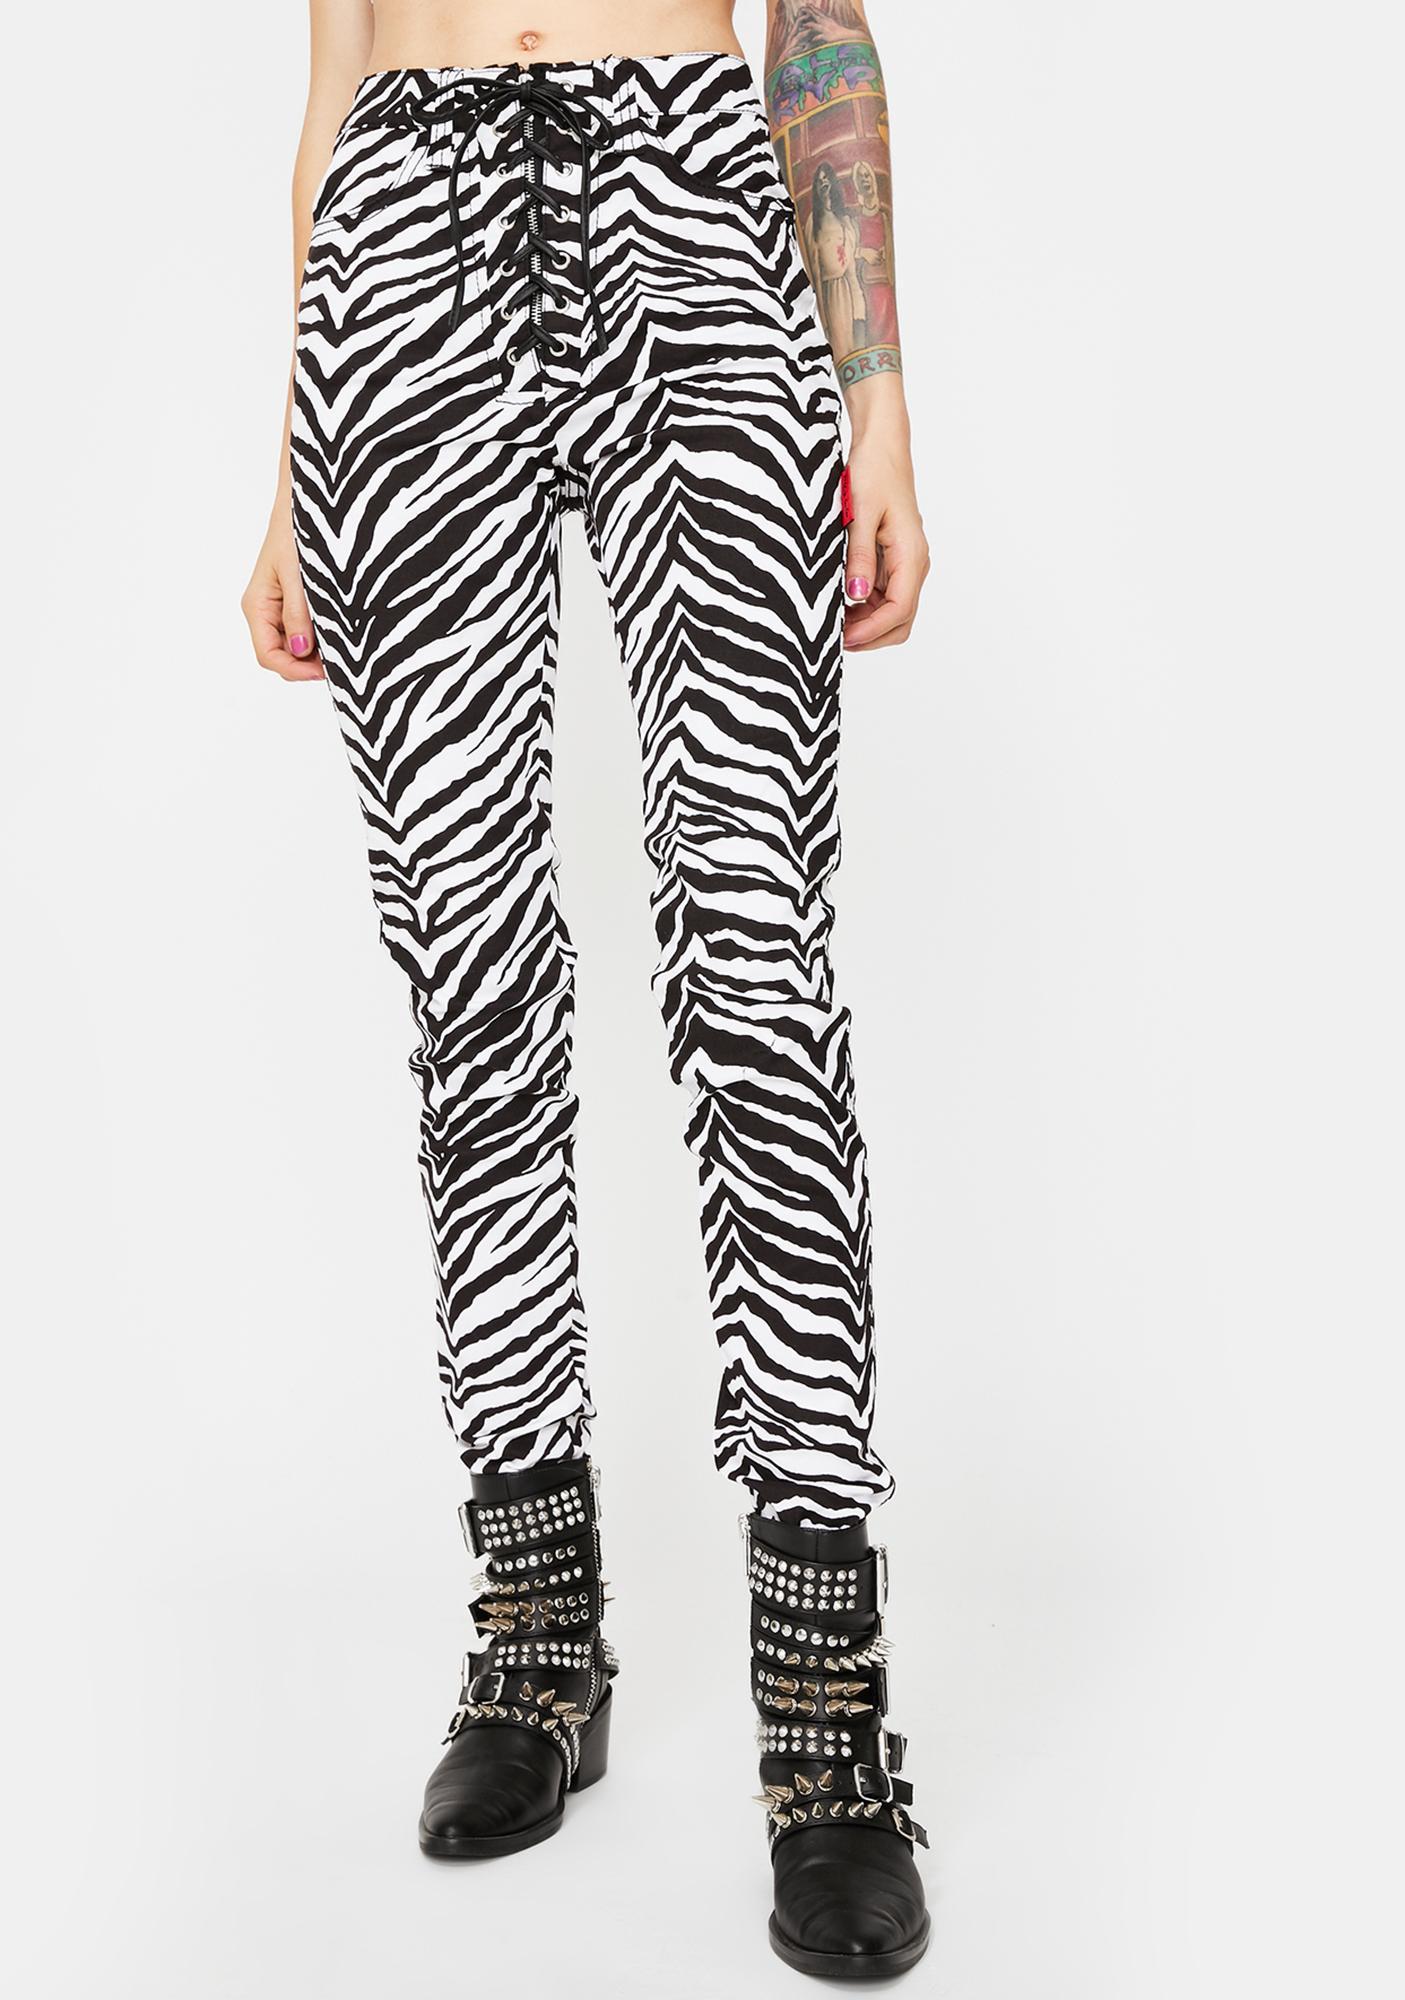 Tripp NYC Zebra High Waist Tie Up Pants